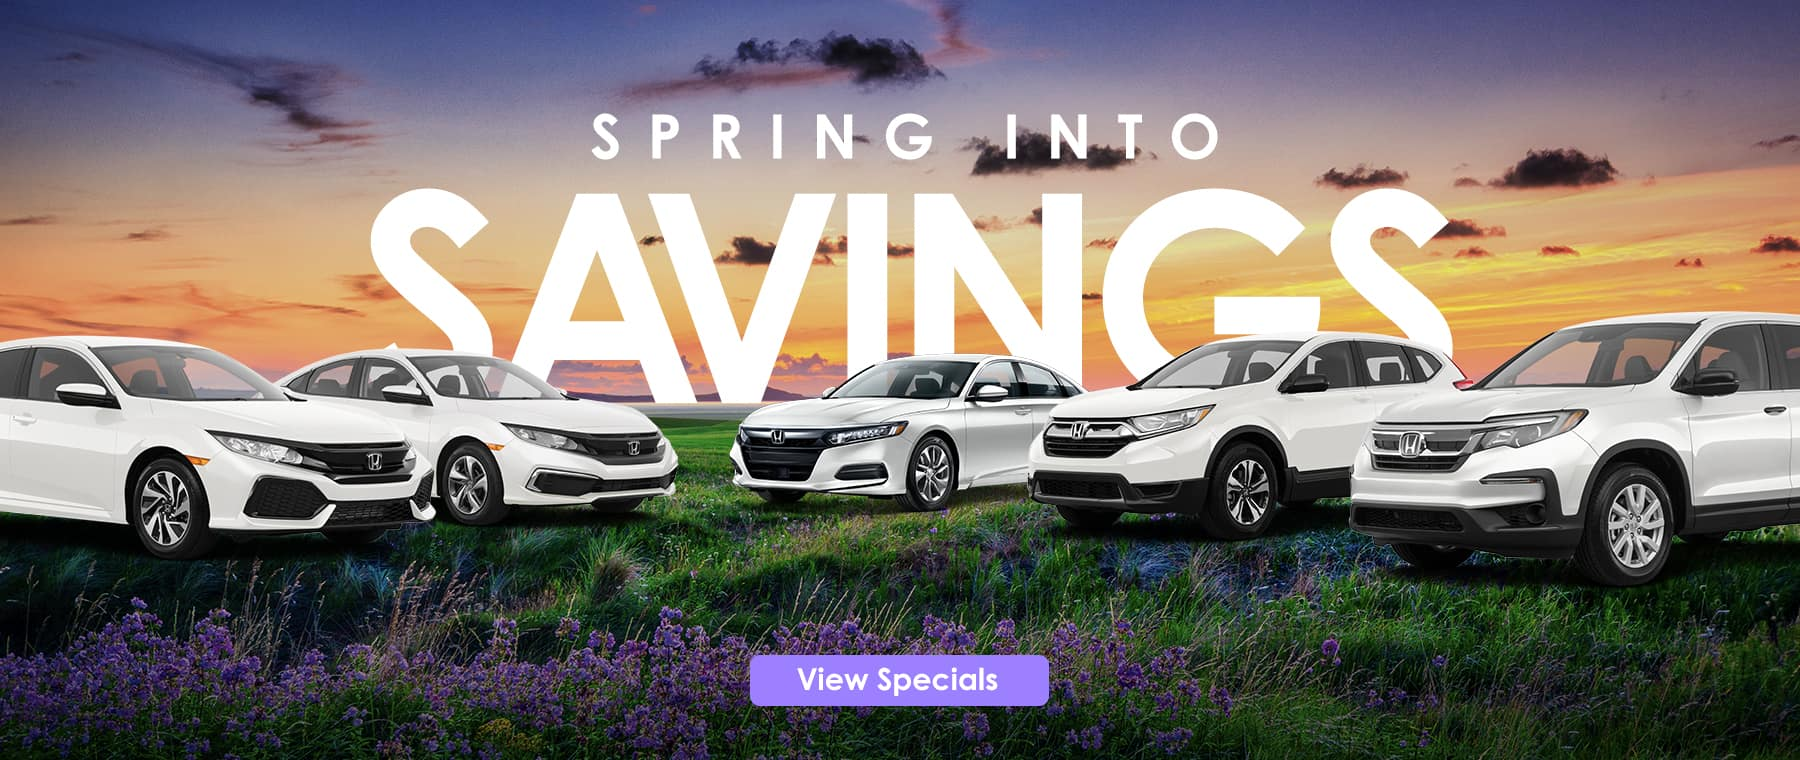 Spring Into Savings Banner